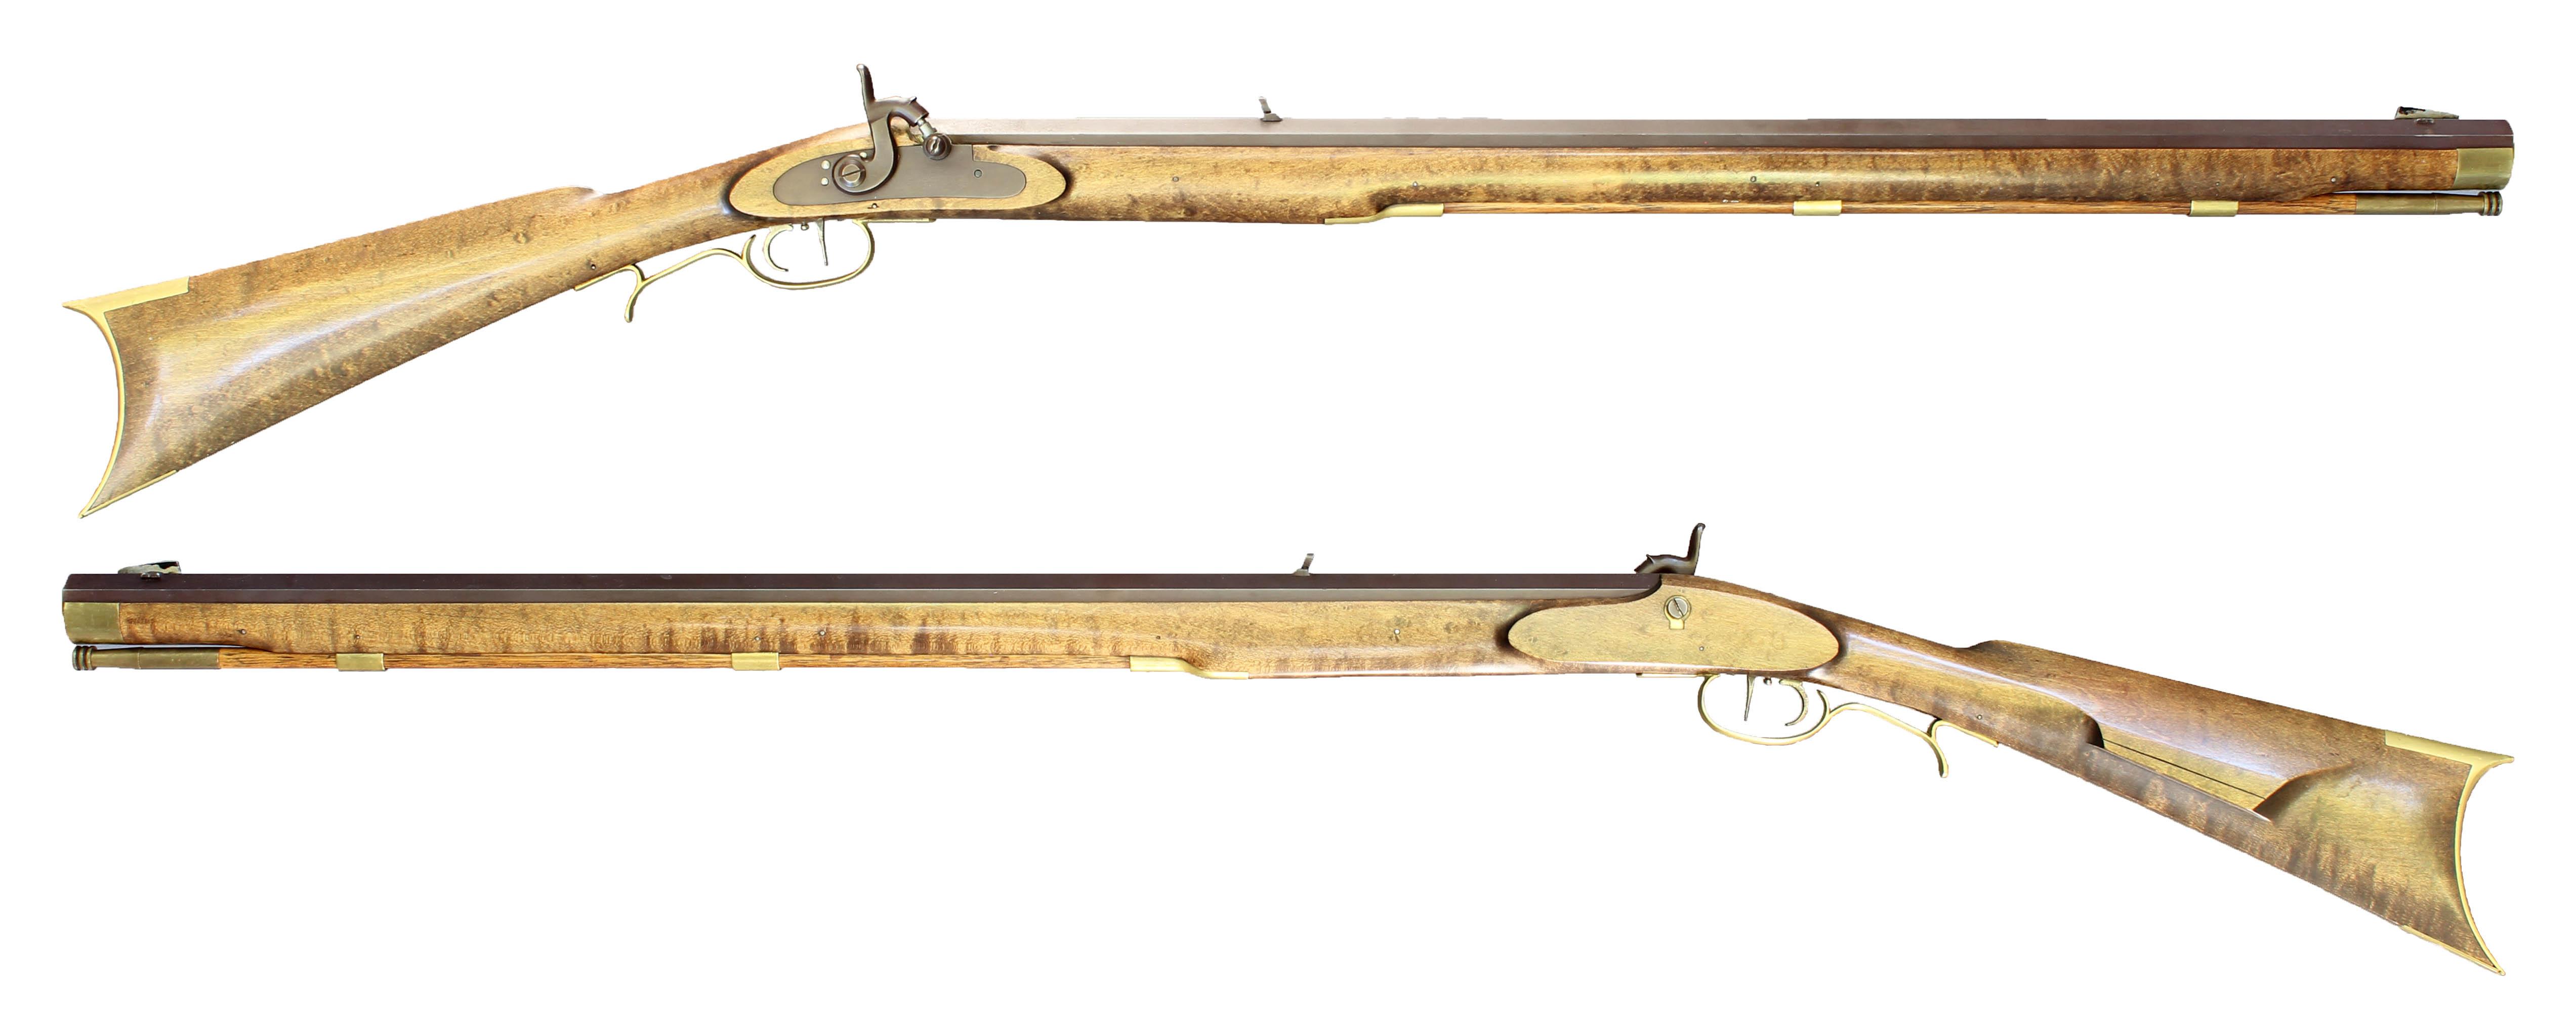 GRRW factory Leman Indian Rifle